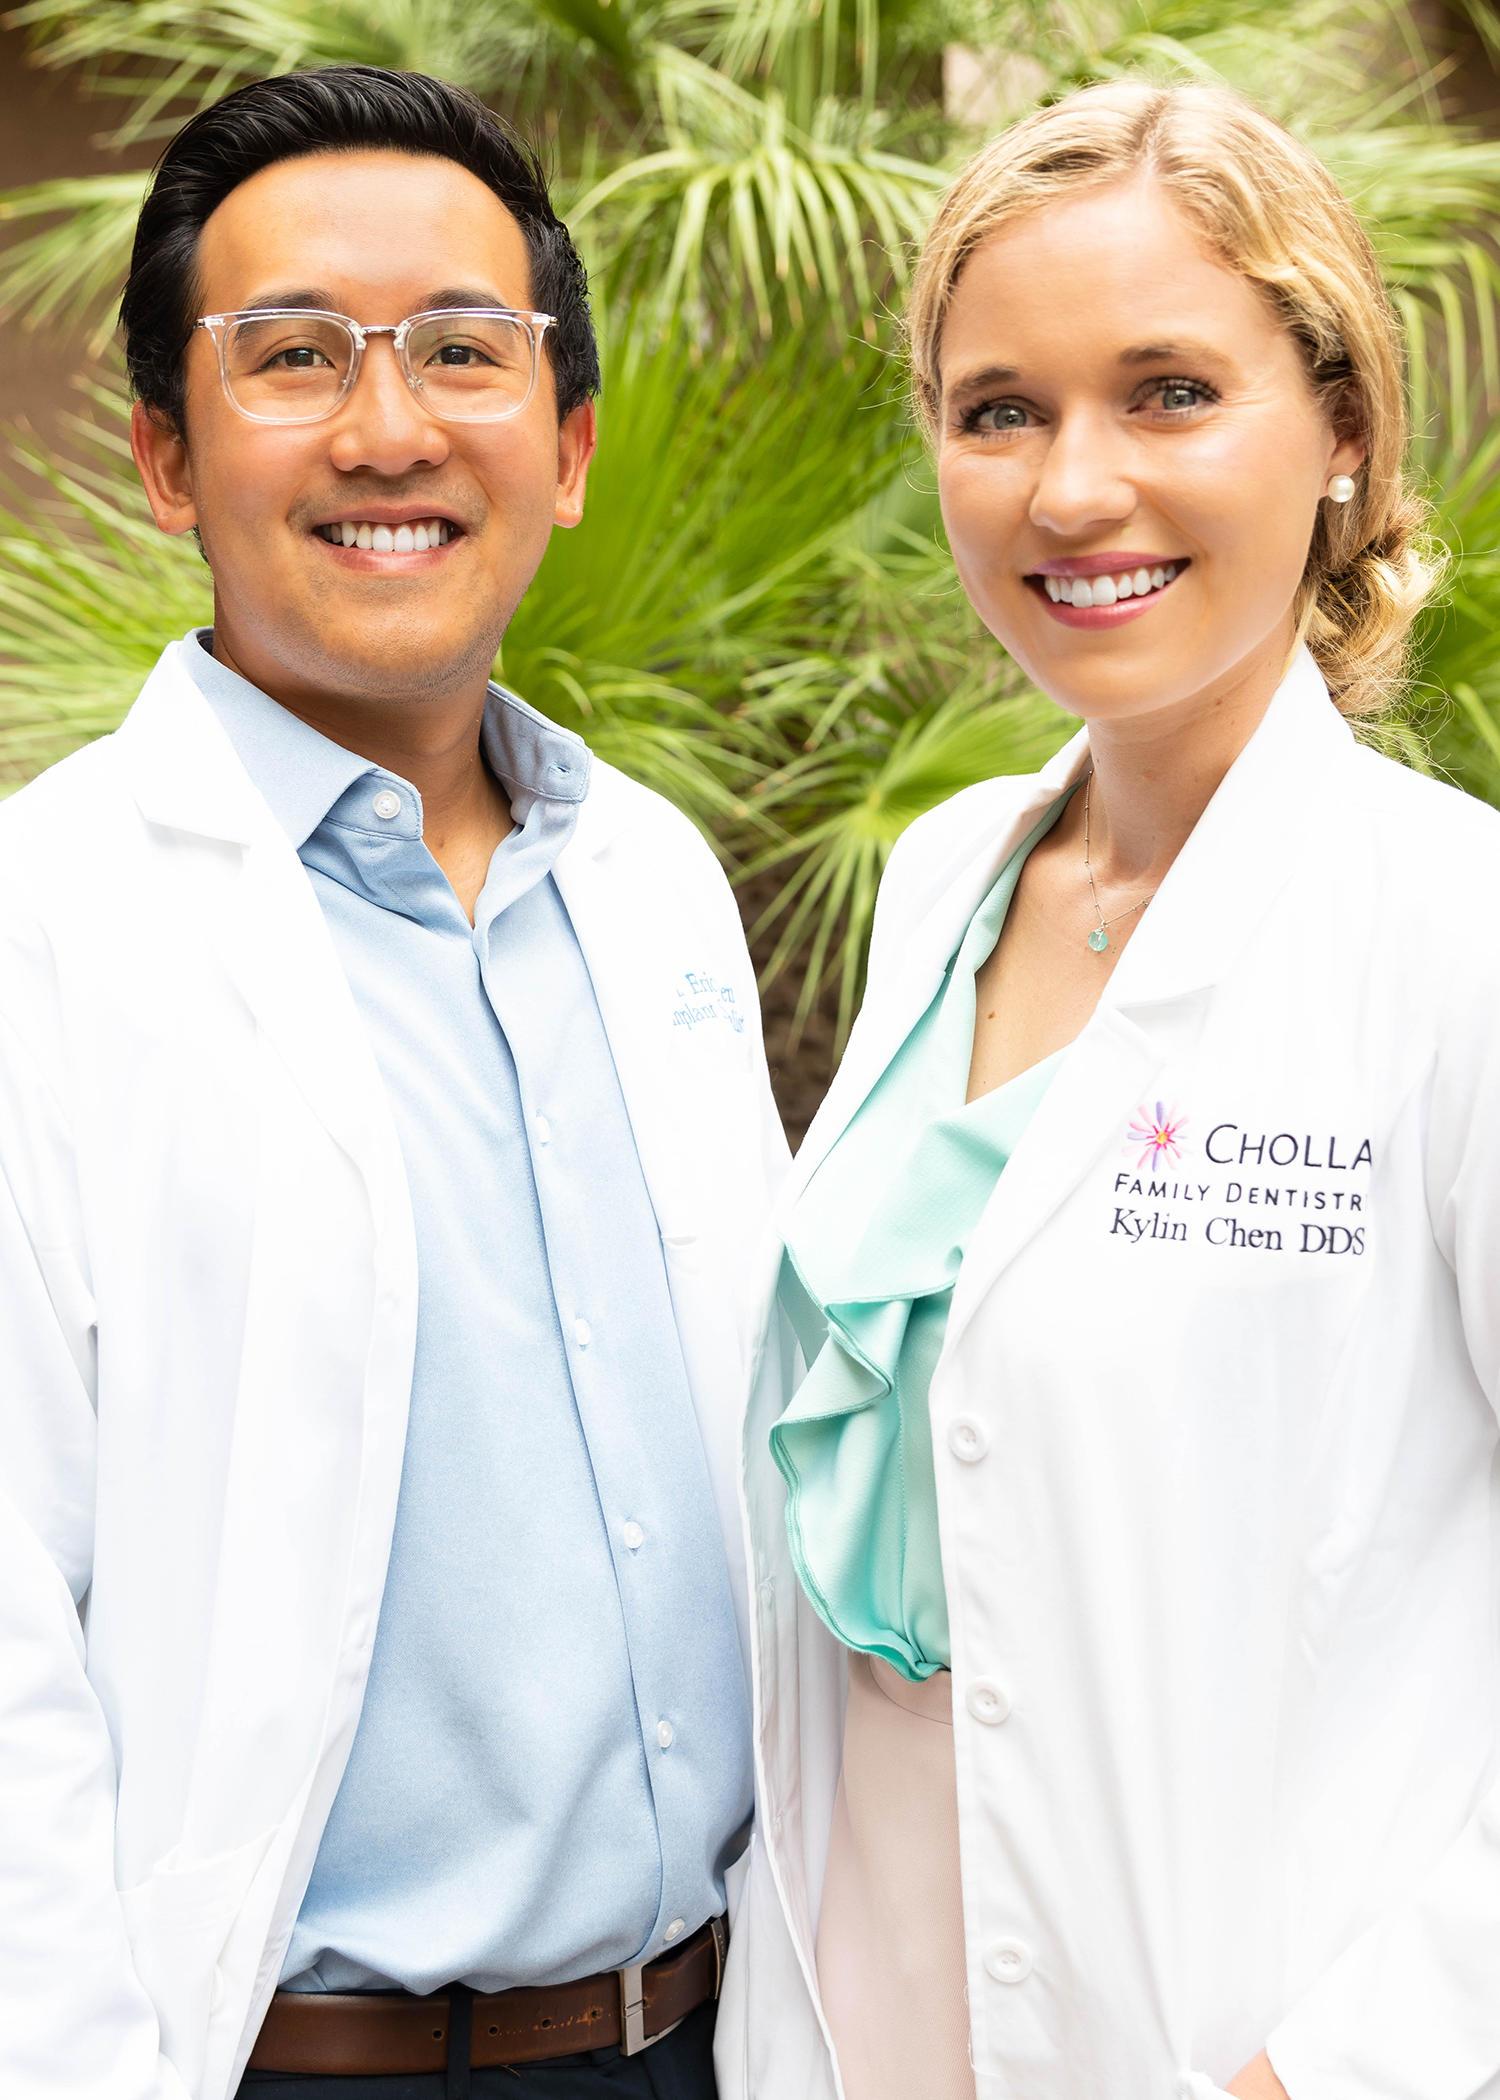 Cholla Family Dentistry image 1